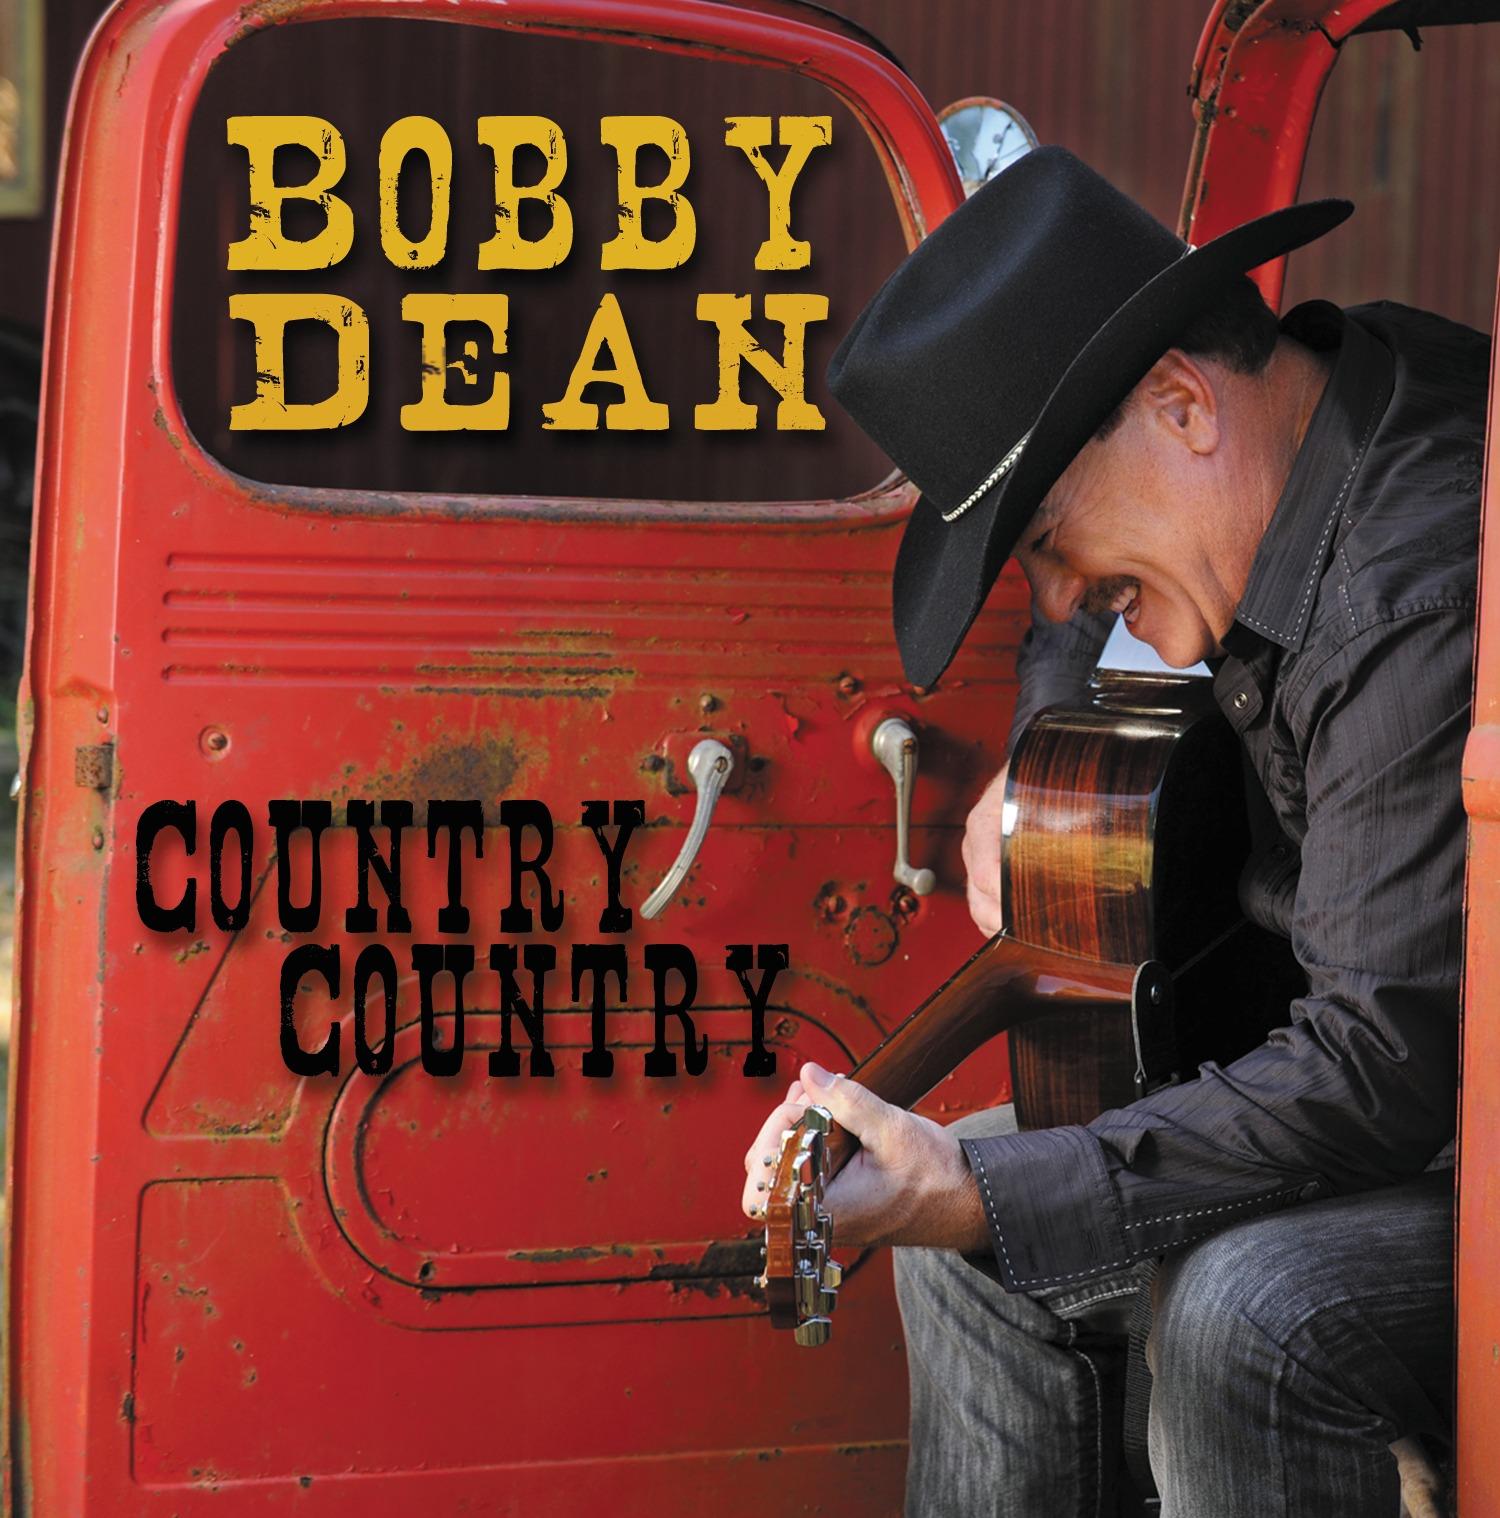 Bobby Dean